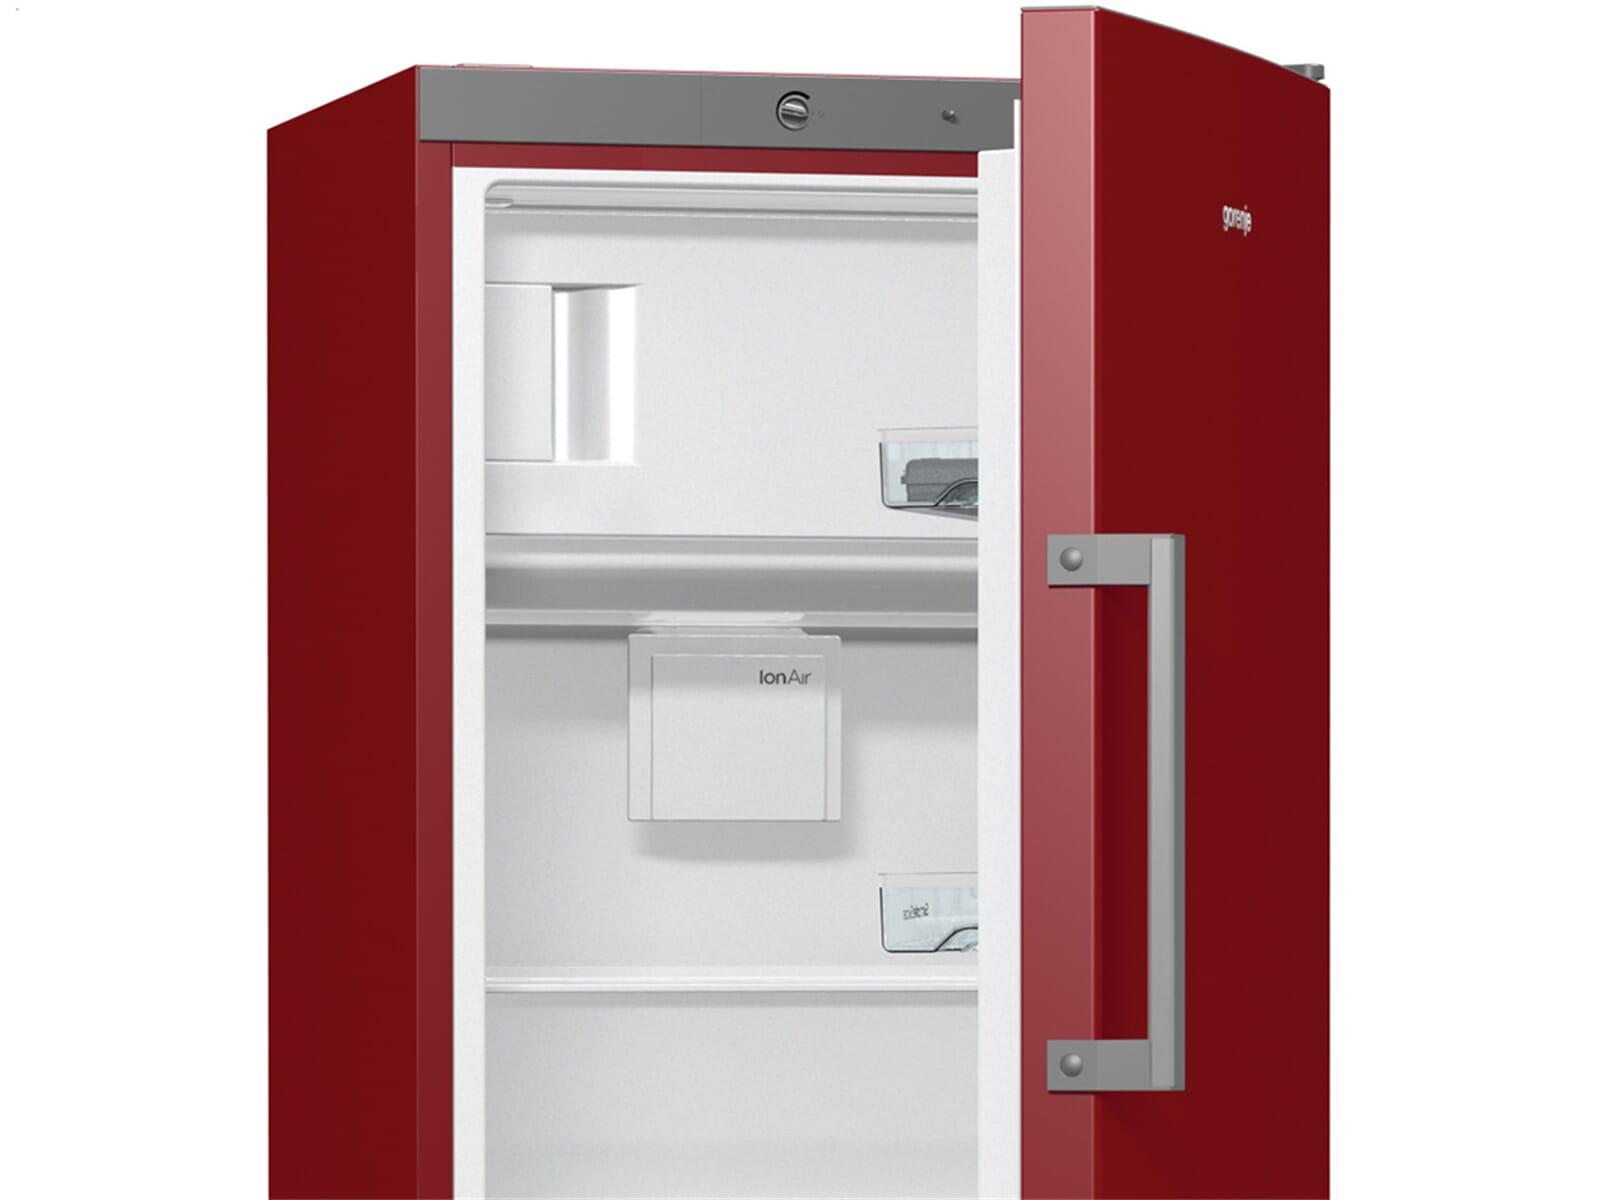 Gorenje Kühlschrank Angebot : Gorenje rb br standkühlschrank burgundy